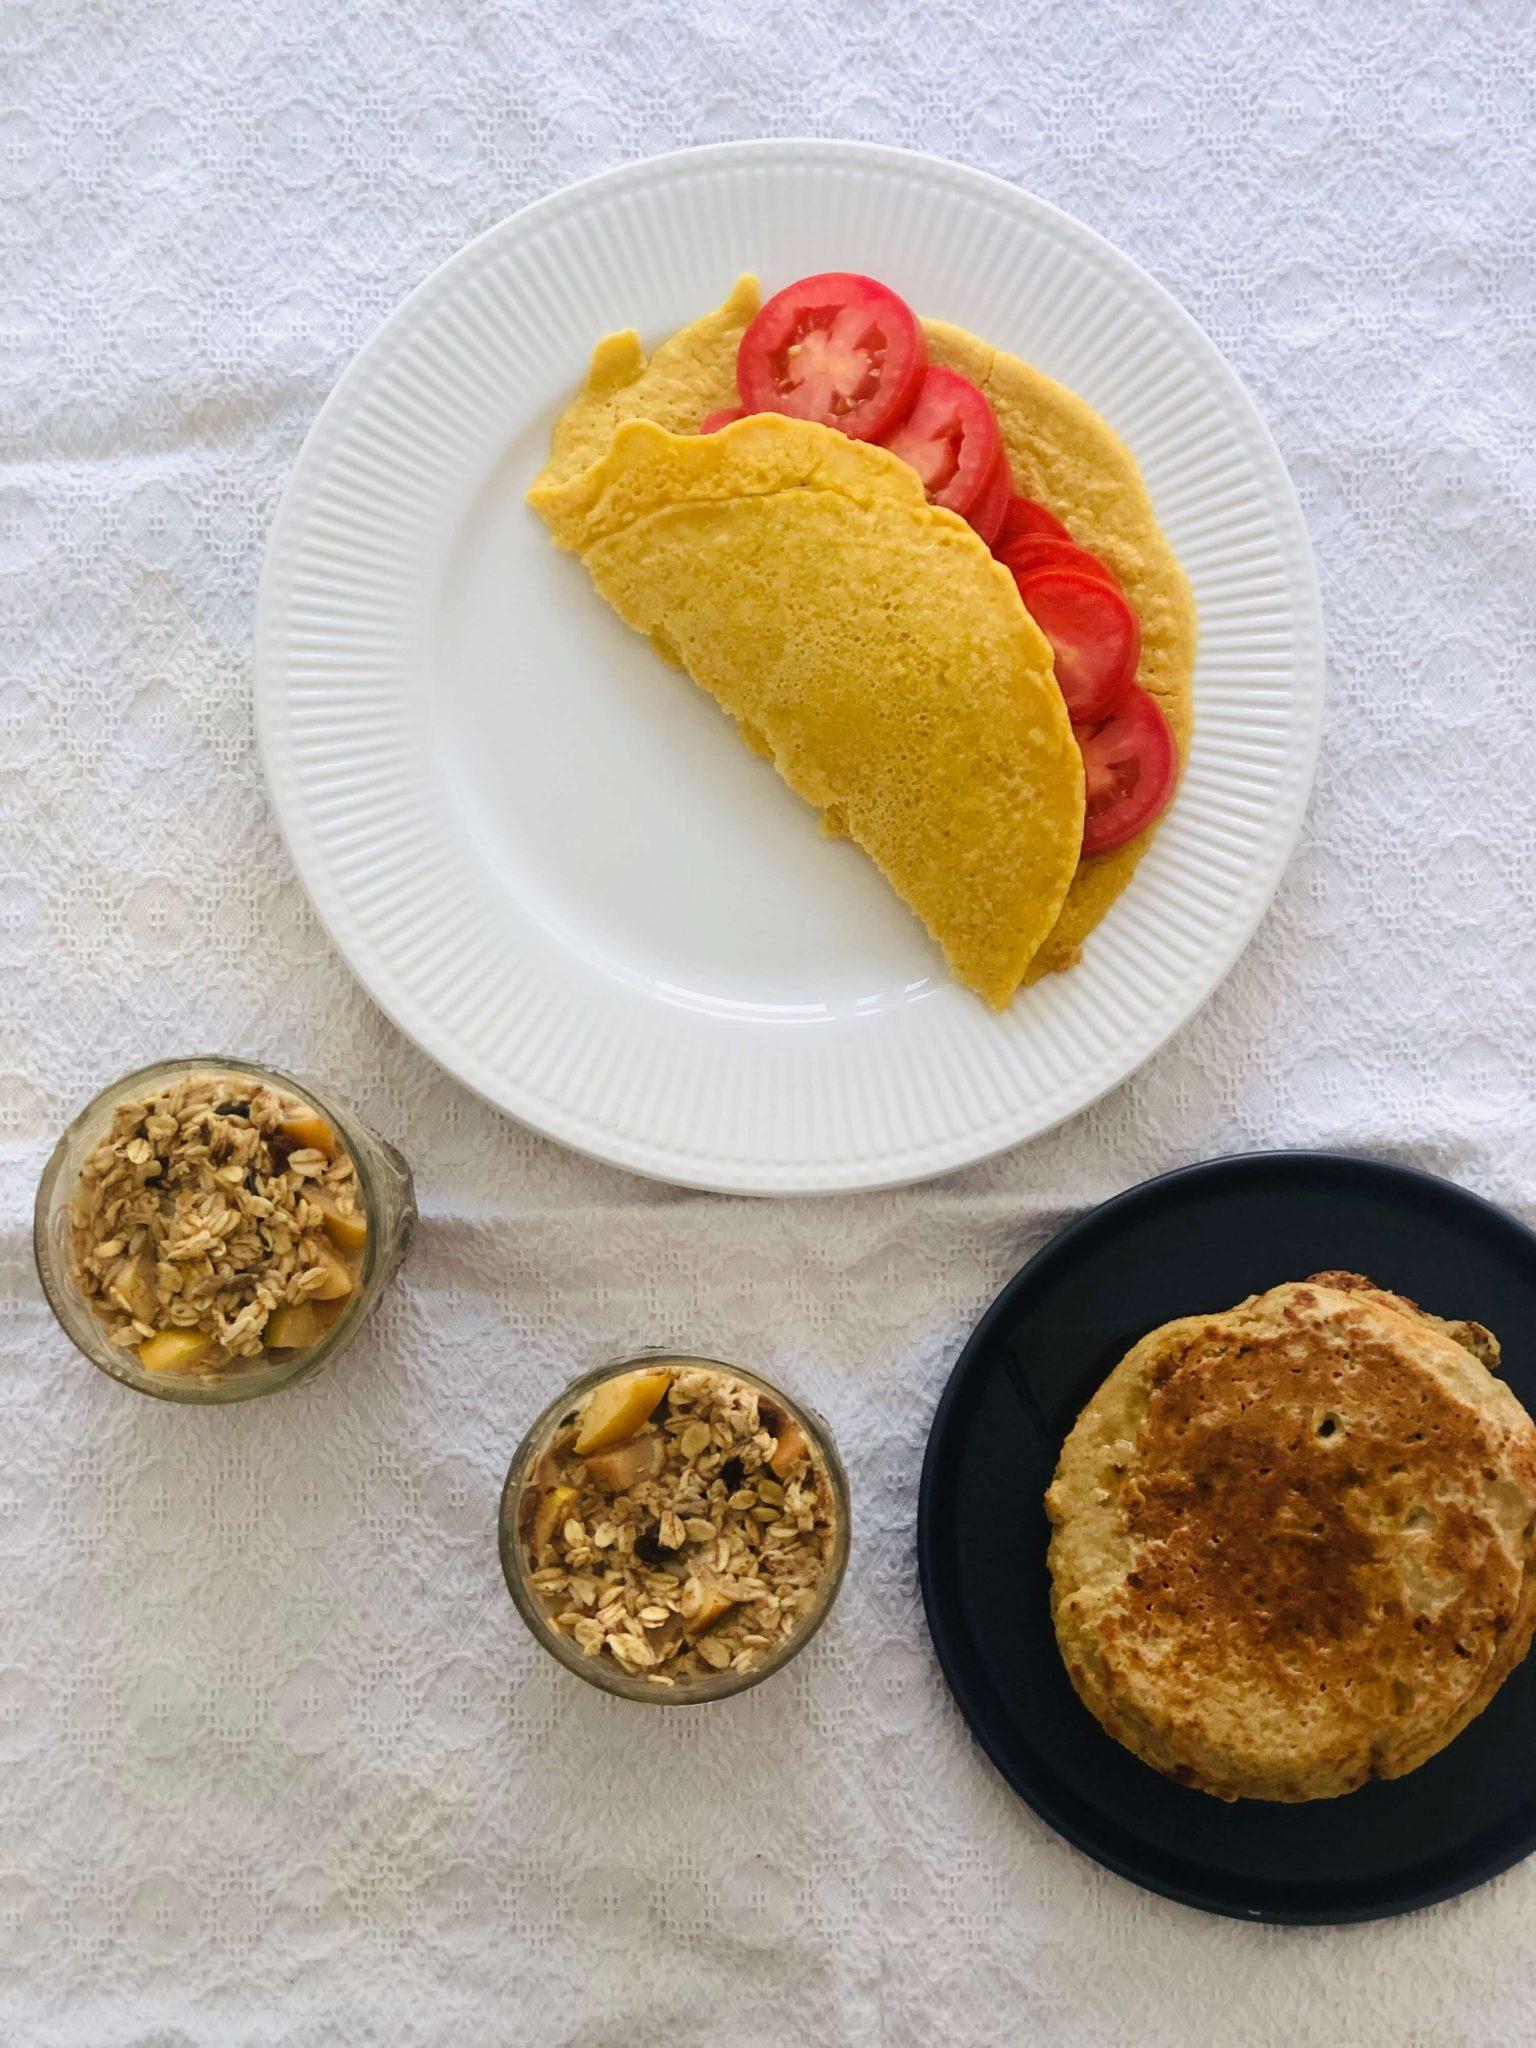 3 pequenos-almoços vegan, simples, rápidos e deliciosos (e pode preparar com antecedência!)